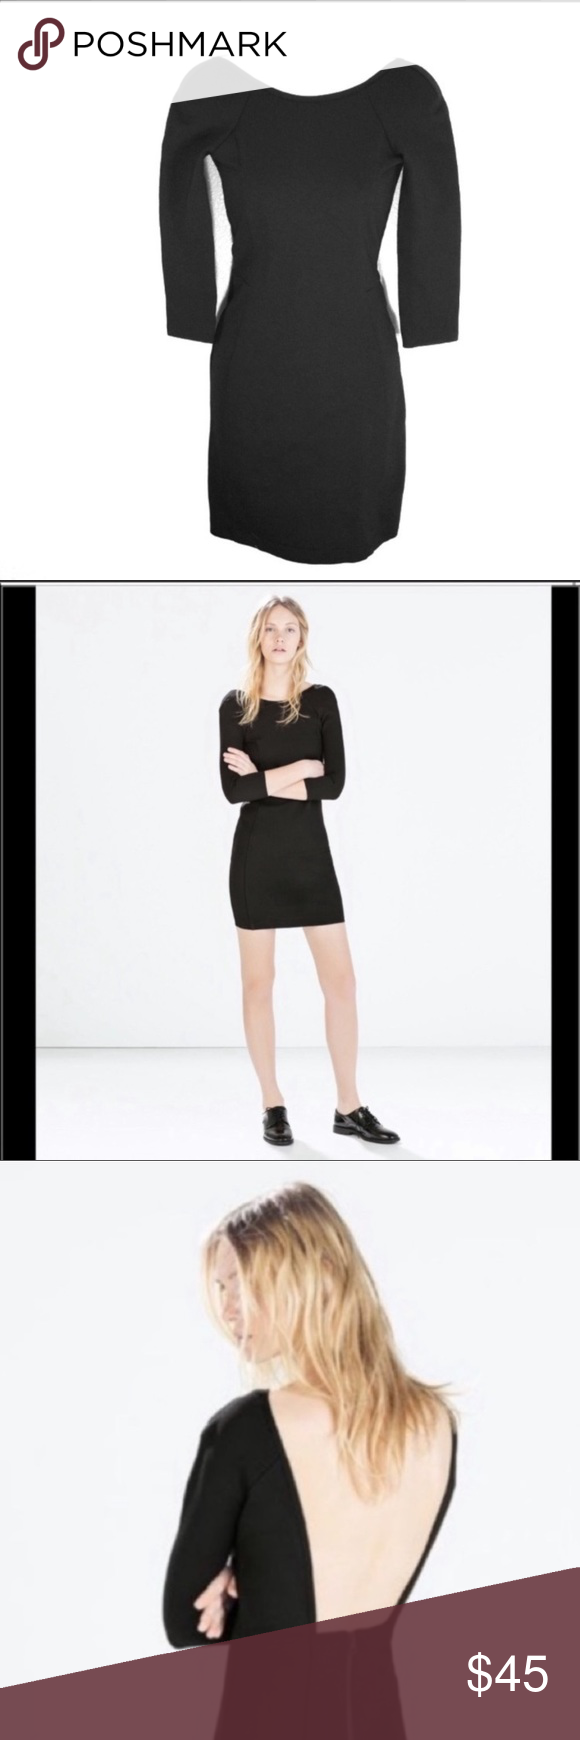 Zara Black Open Back Stretch Knit Dress Zara Black Open Back Dress Zipper In Back Thick Stretch Material Similar To Stretch Knit Dress Zara Black Knit Dress [ 1740 x 580 Pixel ]